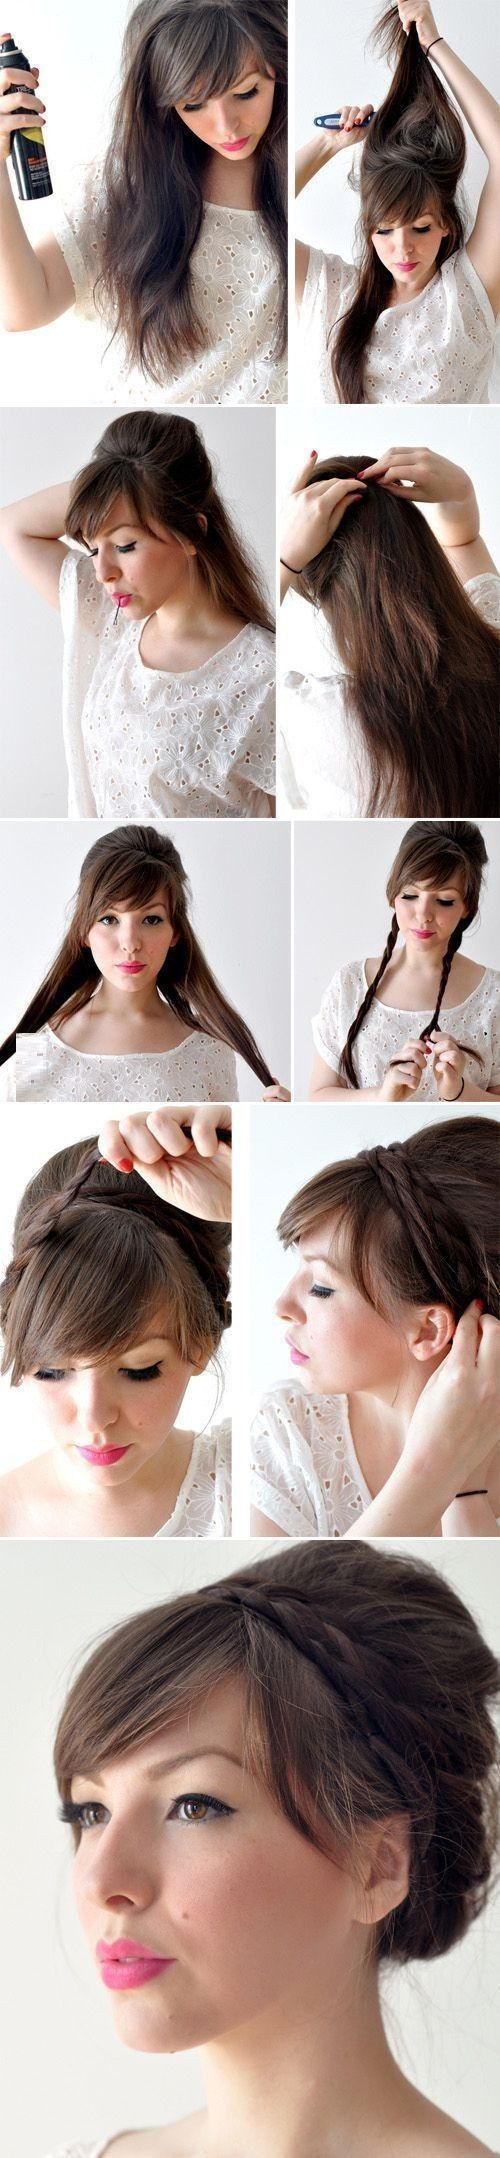 Updo for long hair, Beehive + Milkmaid Braids